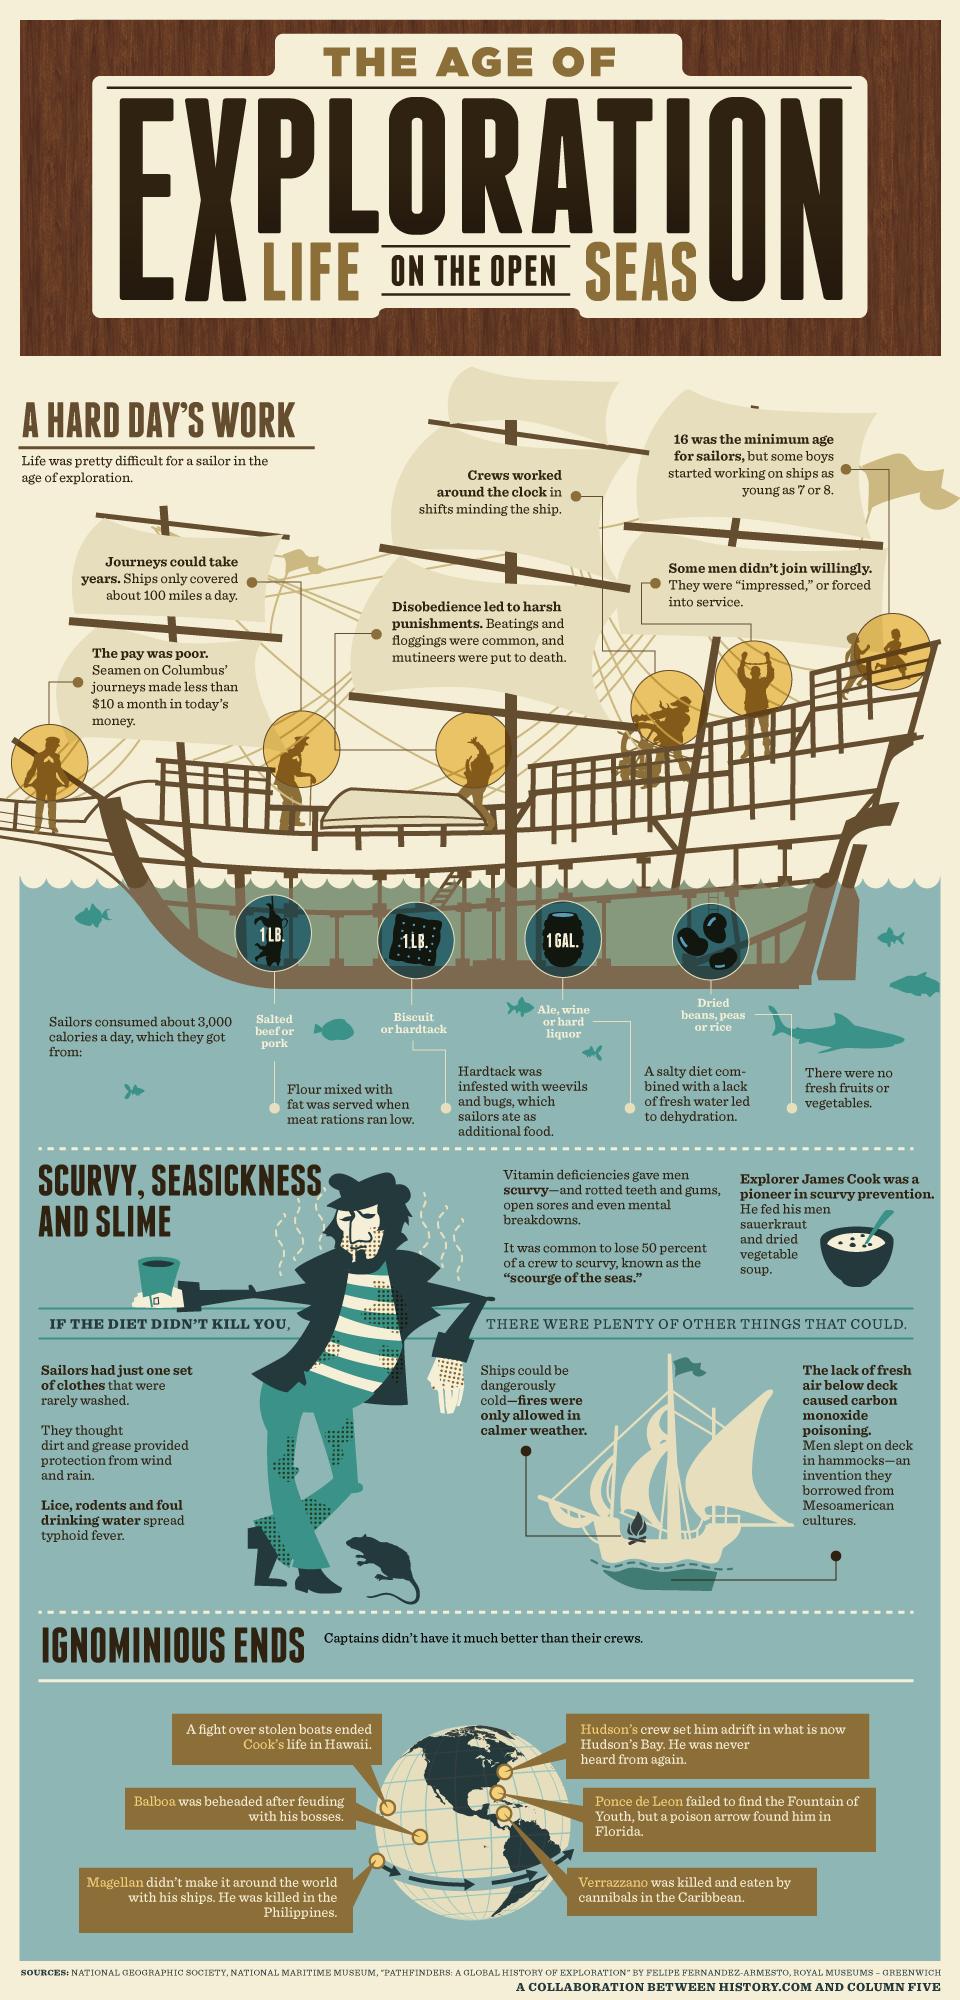 the-age-of-exploration-life-on-the-open-seas_50f70cf41edbc